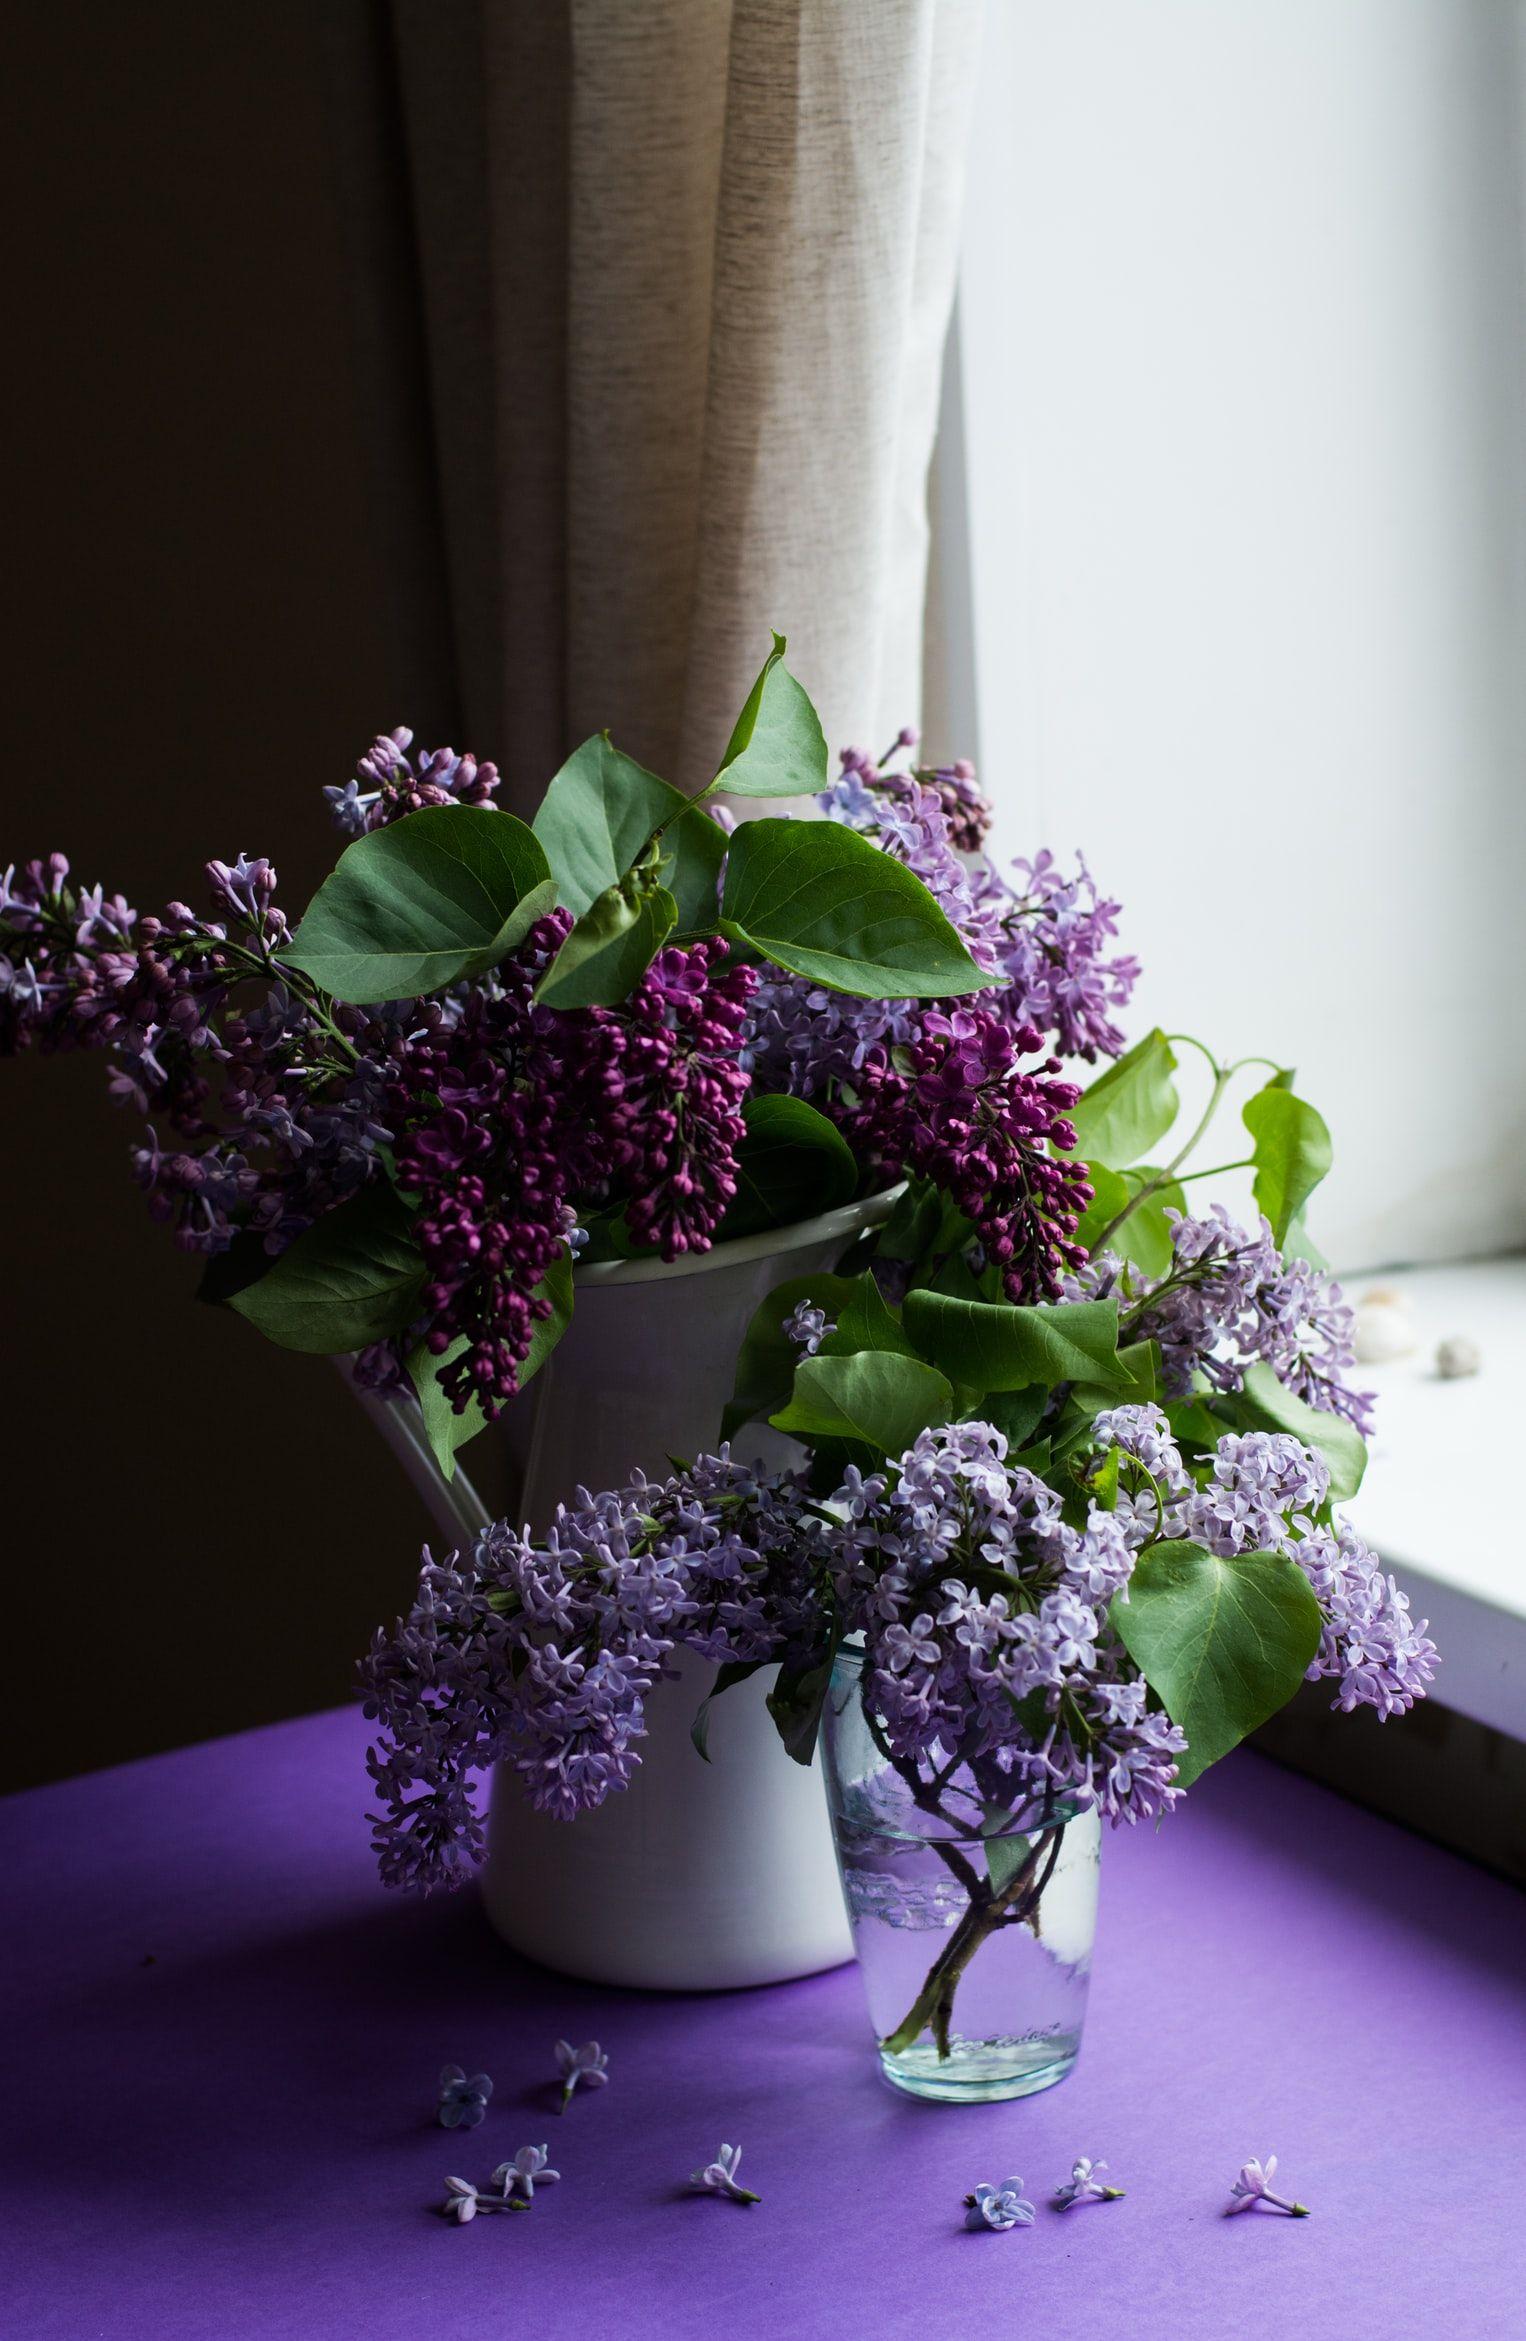 صور 2019 صور انستا صور خلفيات بنات صور سوداء صور جميلة جديدة صور غلاف فيس بوك صورة فيديو Purple Flowers Garden Purple Flowers Purple Flowers Wallpaper